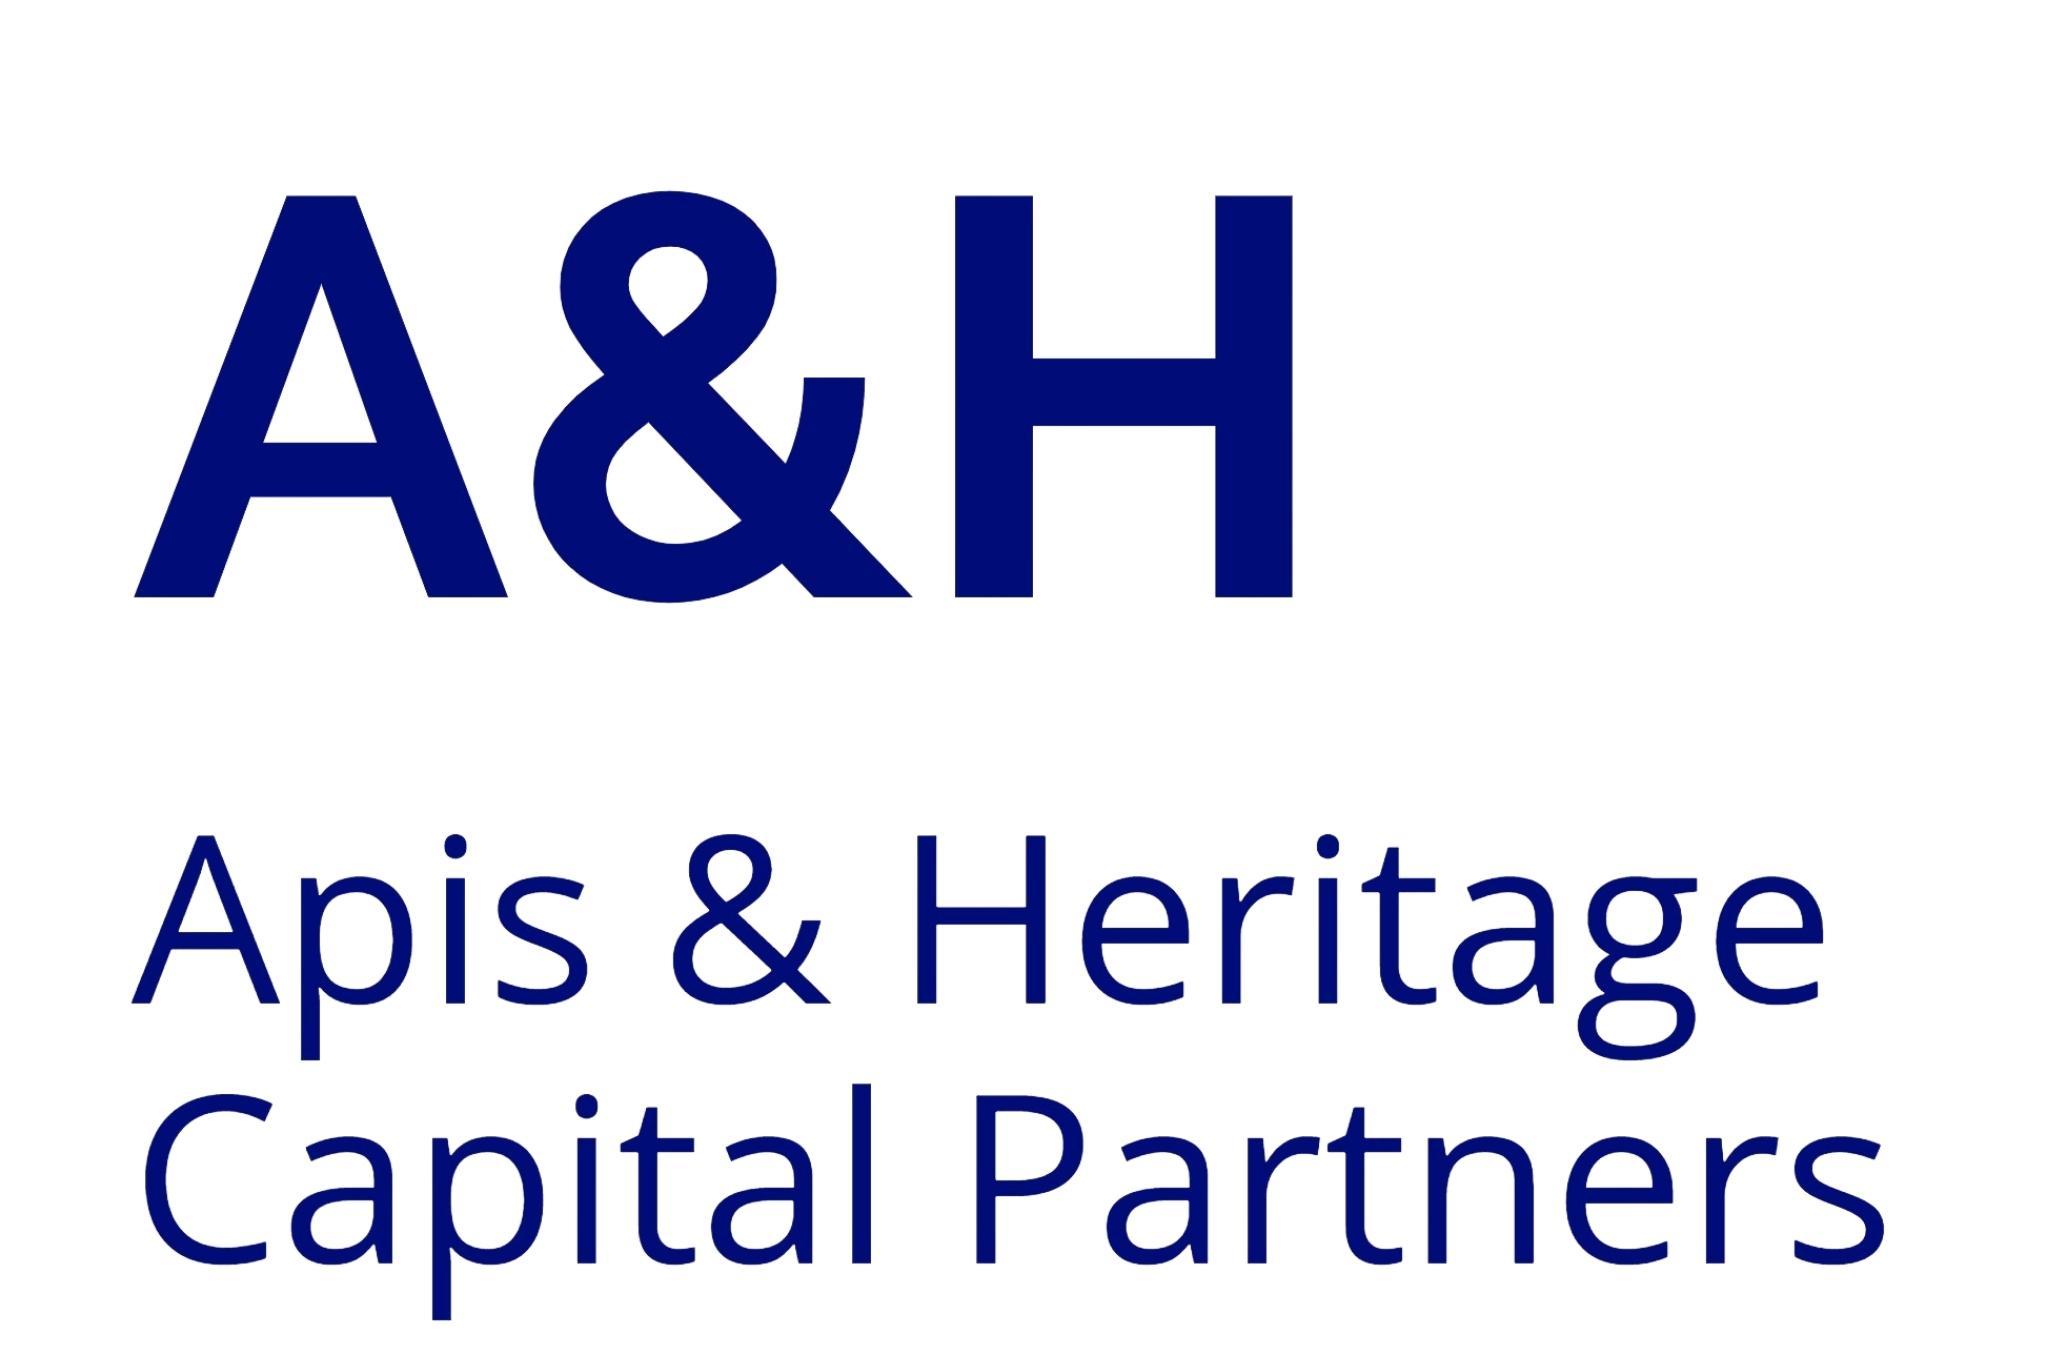 Apis & Heritage Capital Partners